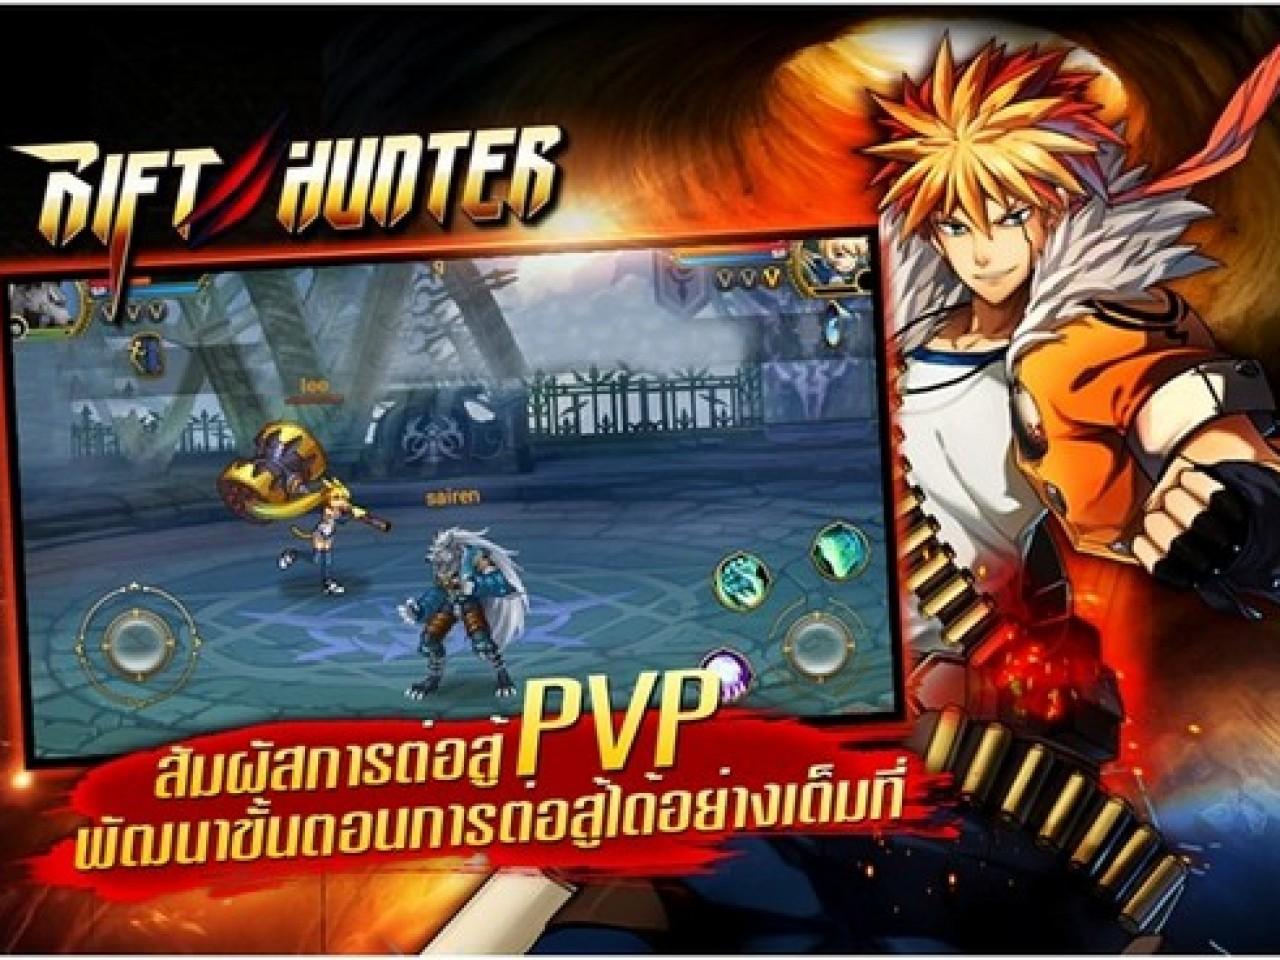 Rift Hunter เกมต่อสู้บนมือถือ พร้อมเปิดความมันส์ CBT 9 ม.ค. นี้